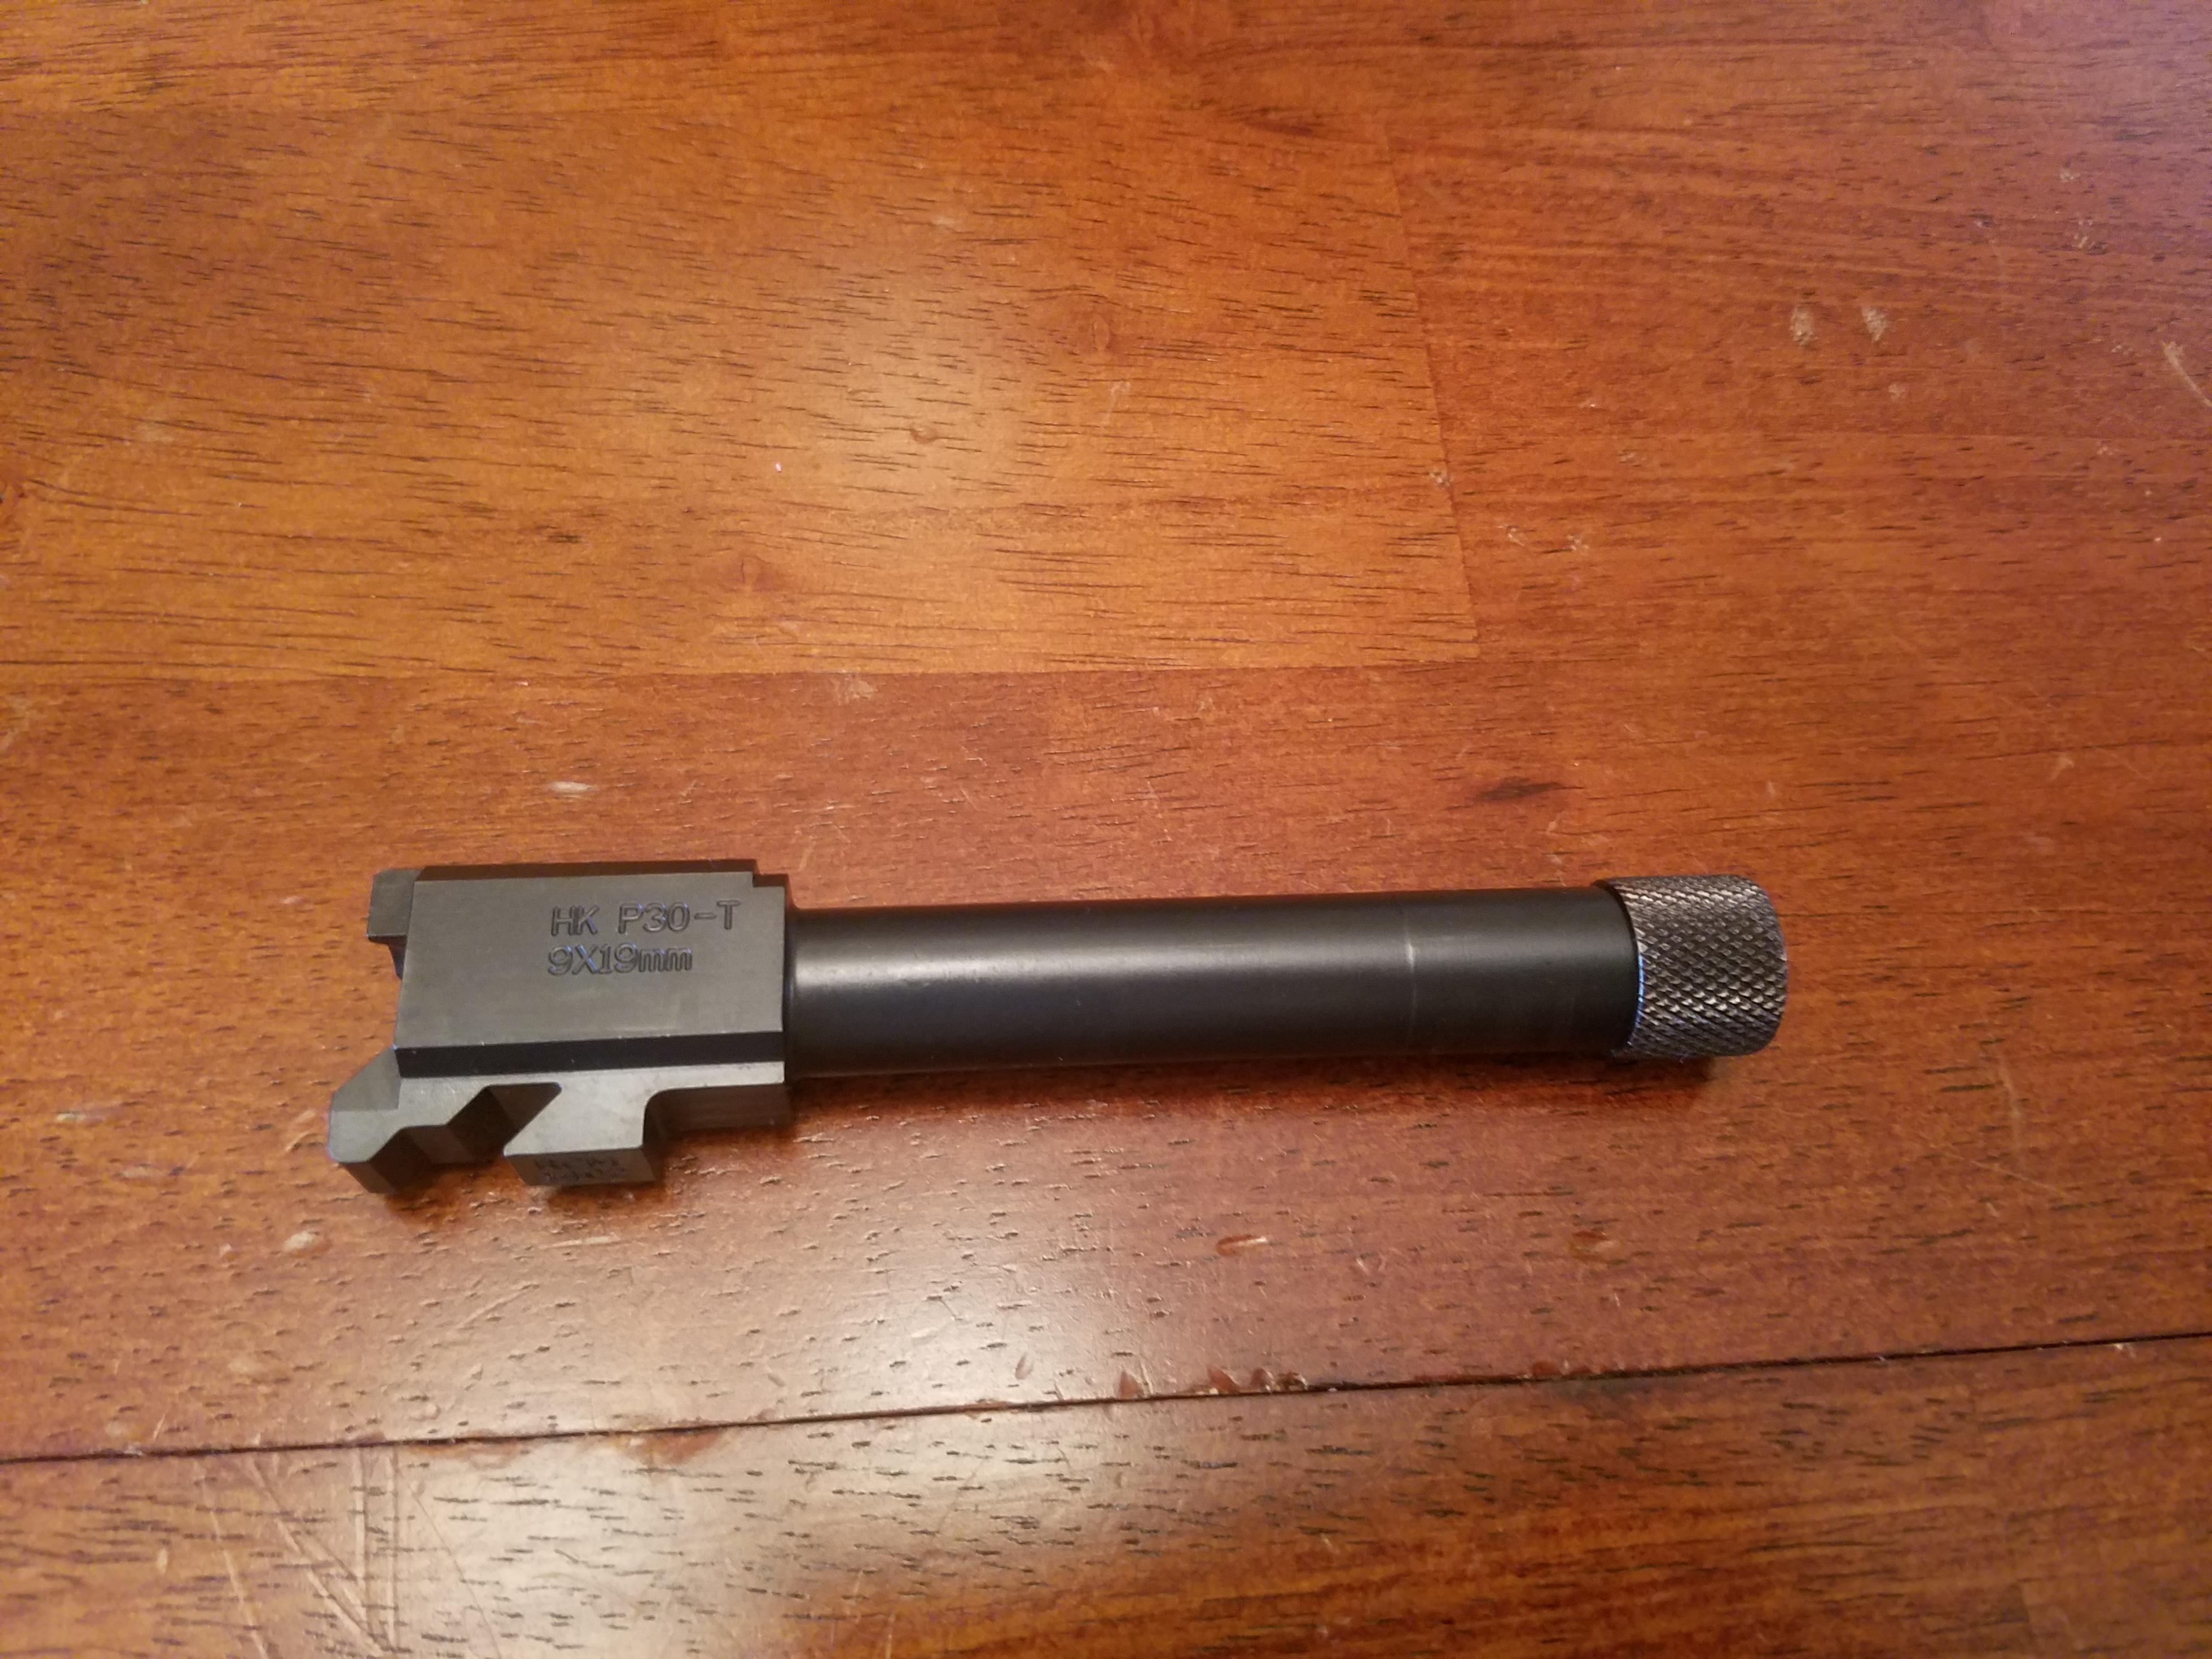 WTS: HK-P30 9mm RCM Threaded Barrel (1/2-28 TPI)-6.jpg